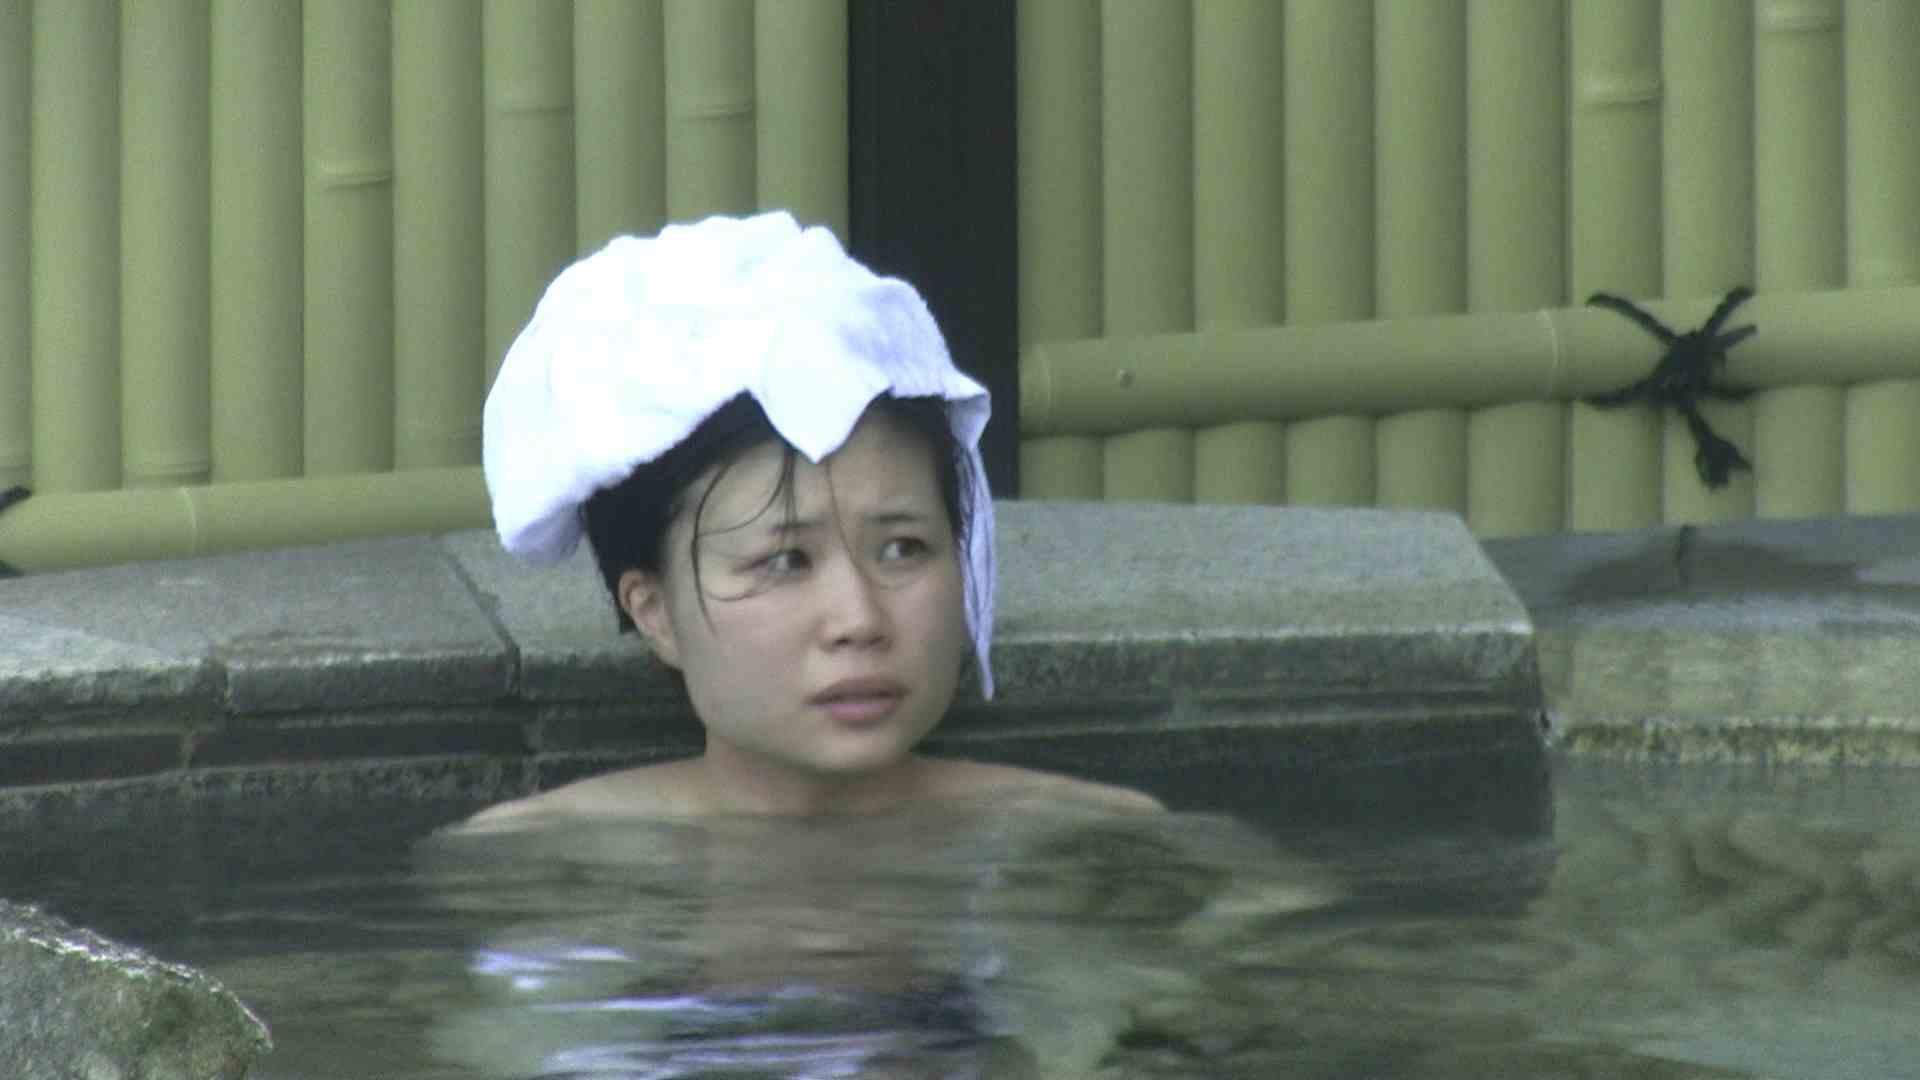 Aquaな露天風呂Vol.183 露天風呂編  104PIX 66